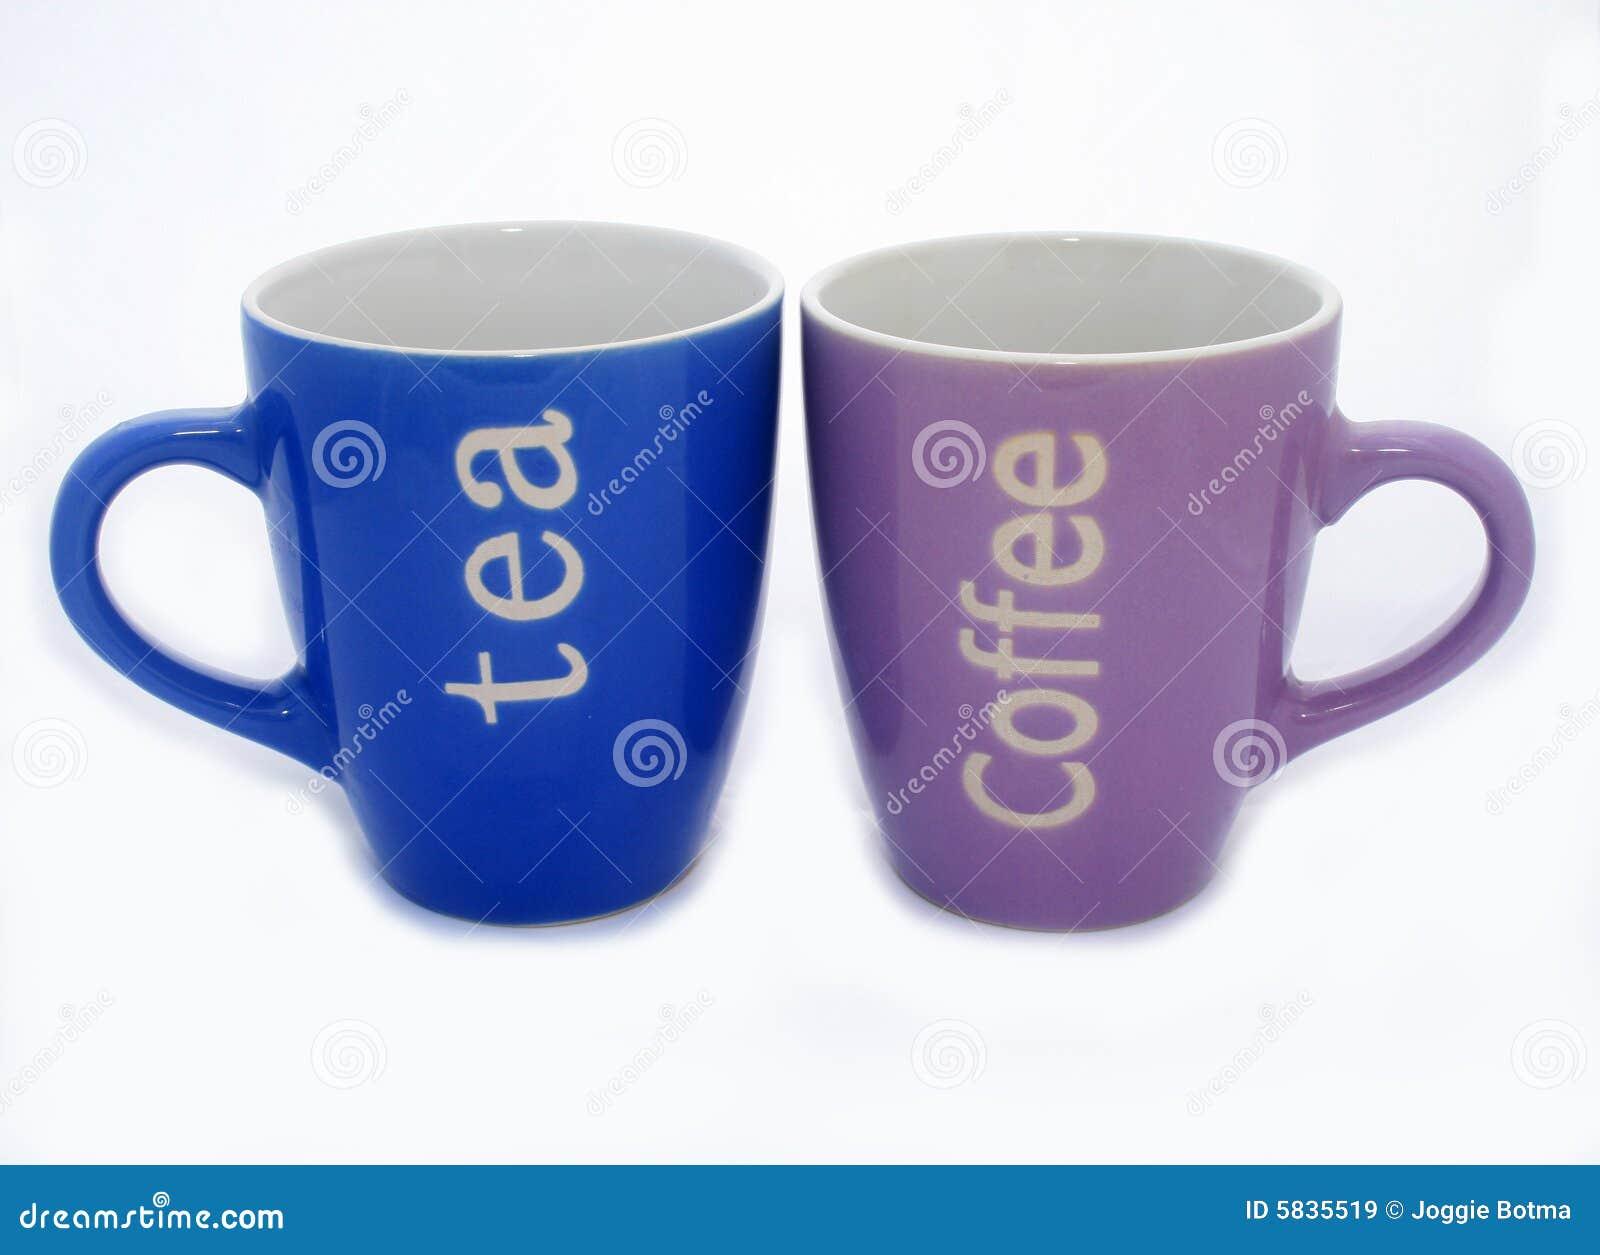 tea and coffee mugs stock image image of coffee coffee pot clip art images coffee pot clip art free